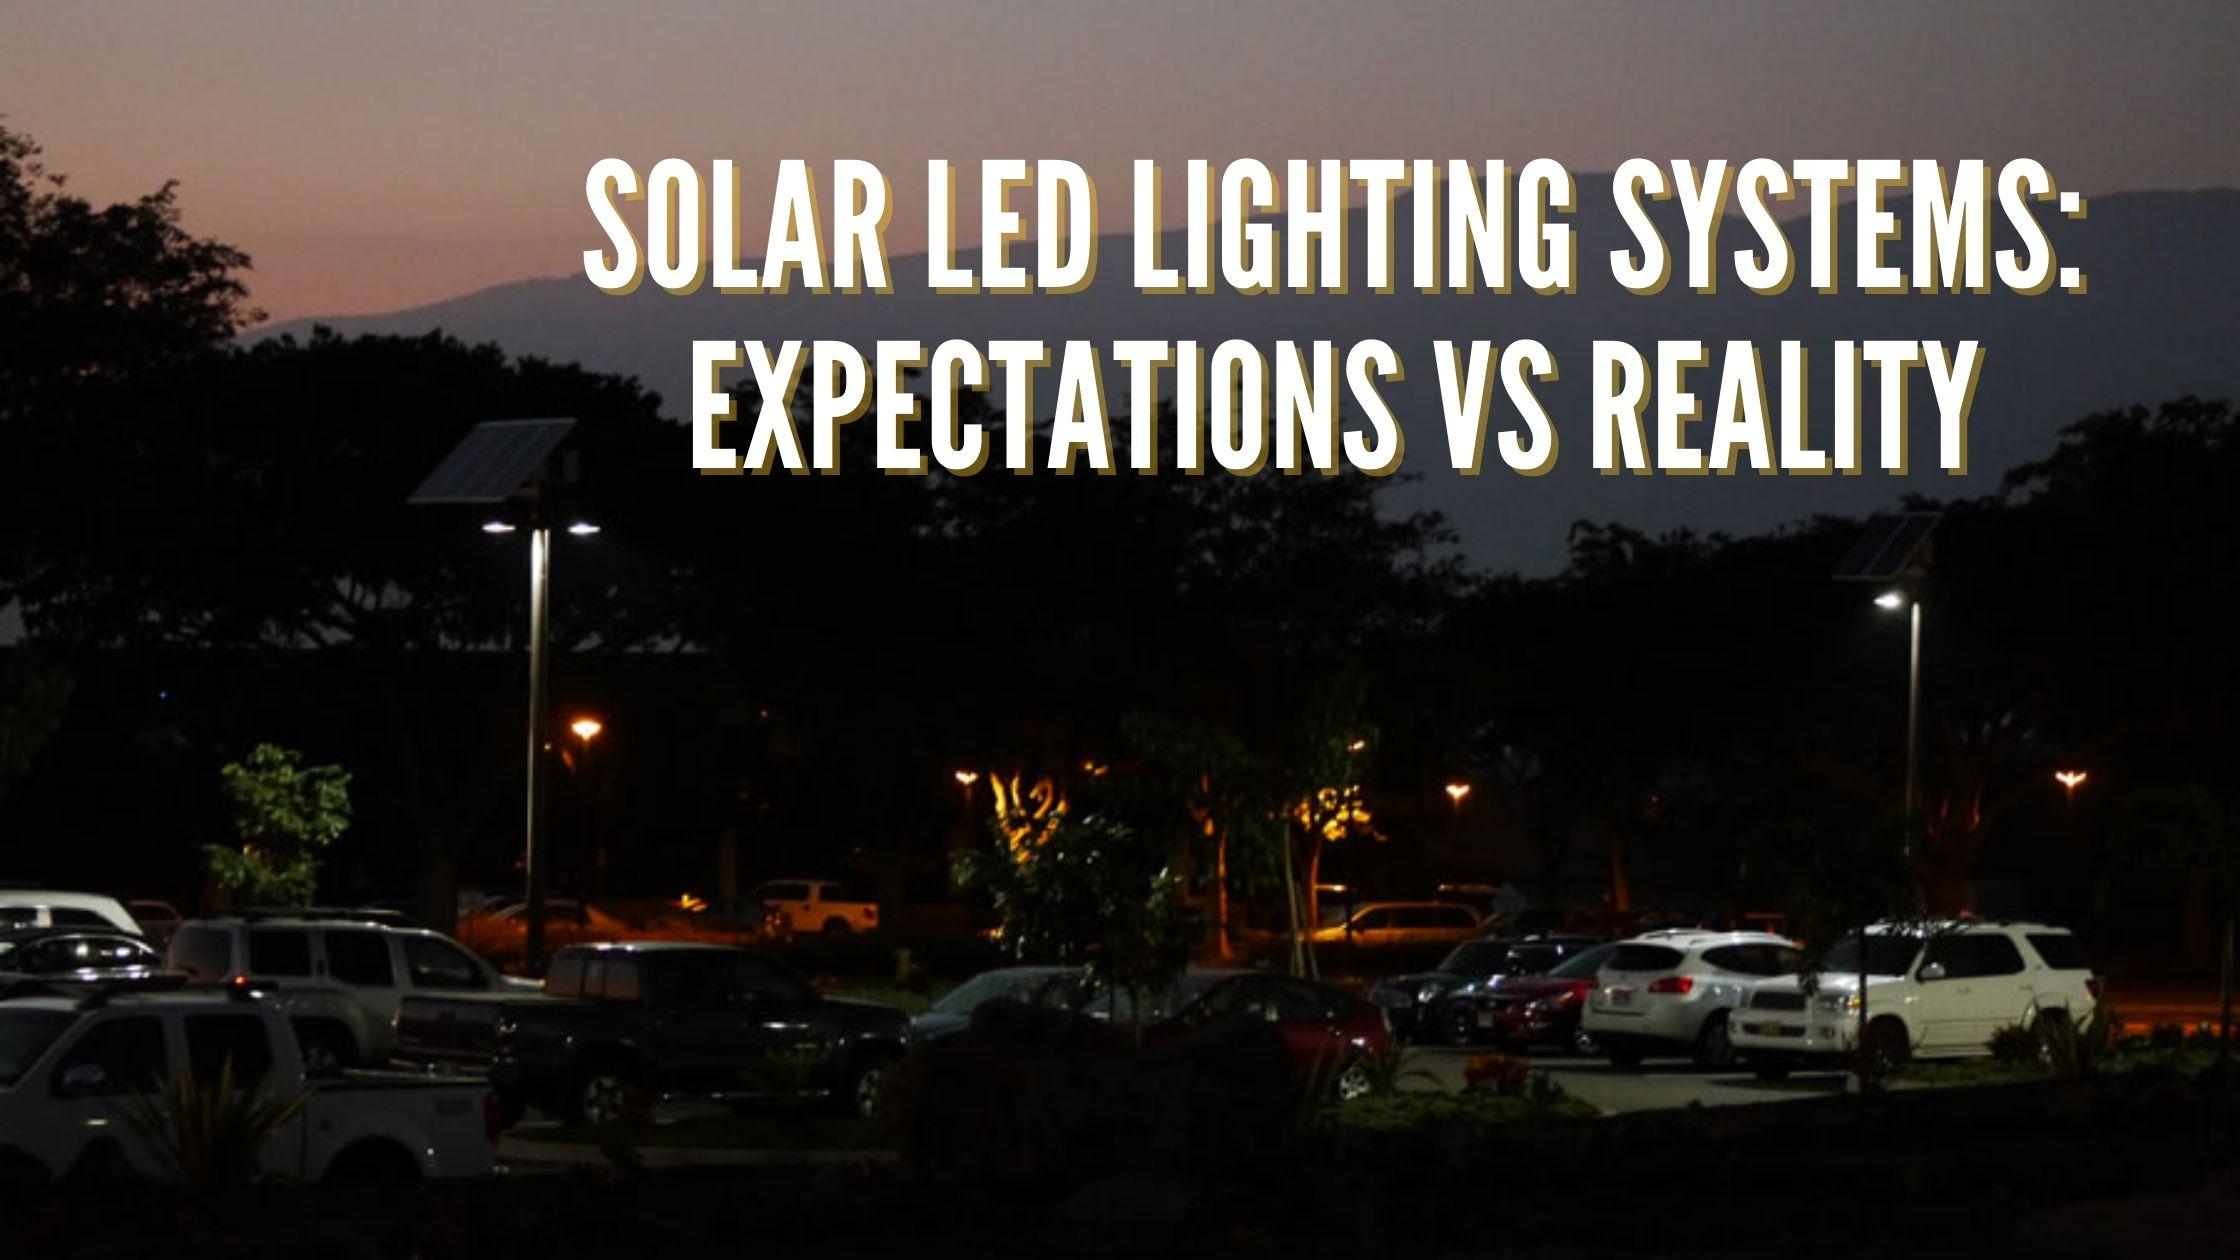 Solar LED Lighting Systems Expectations vs Reality